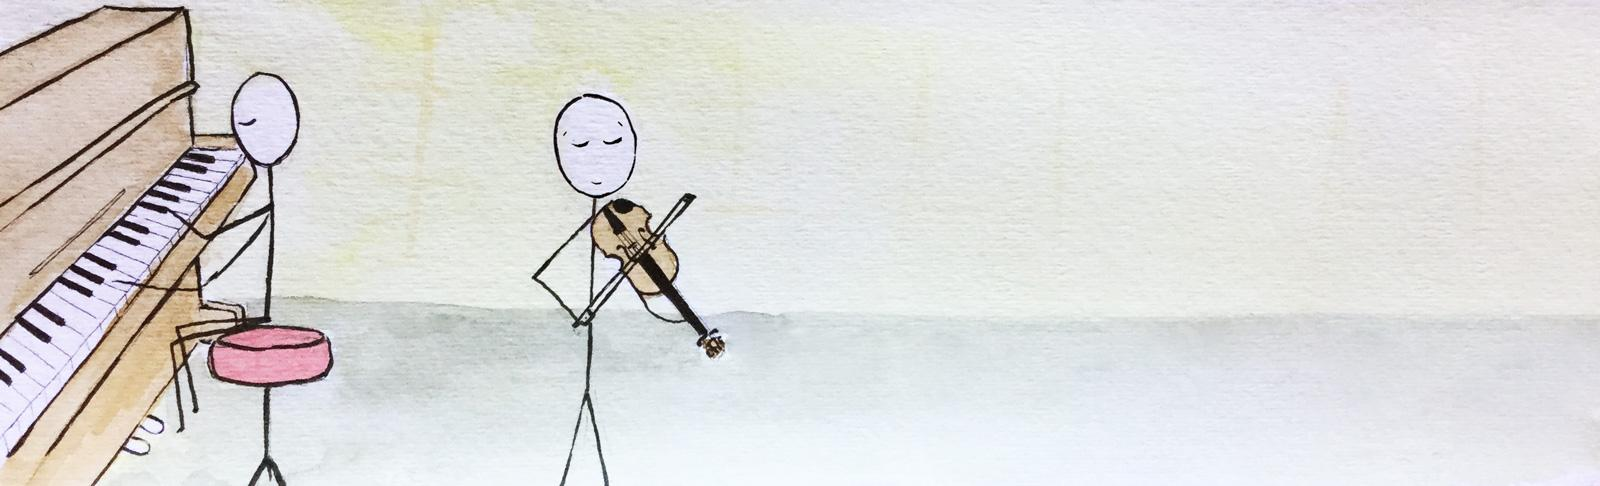 IFR piano and violin